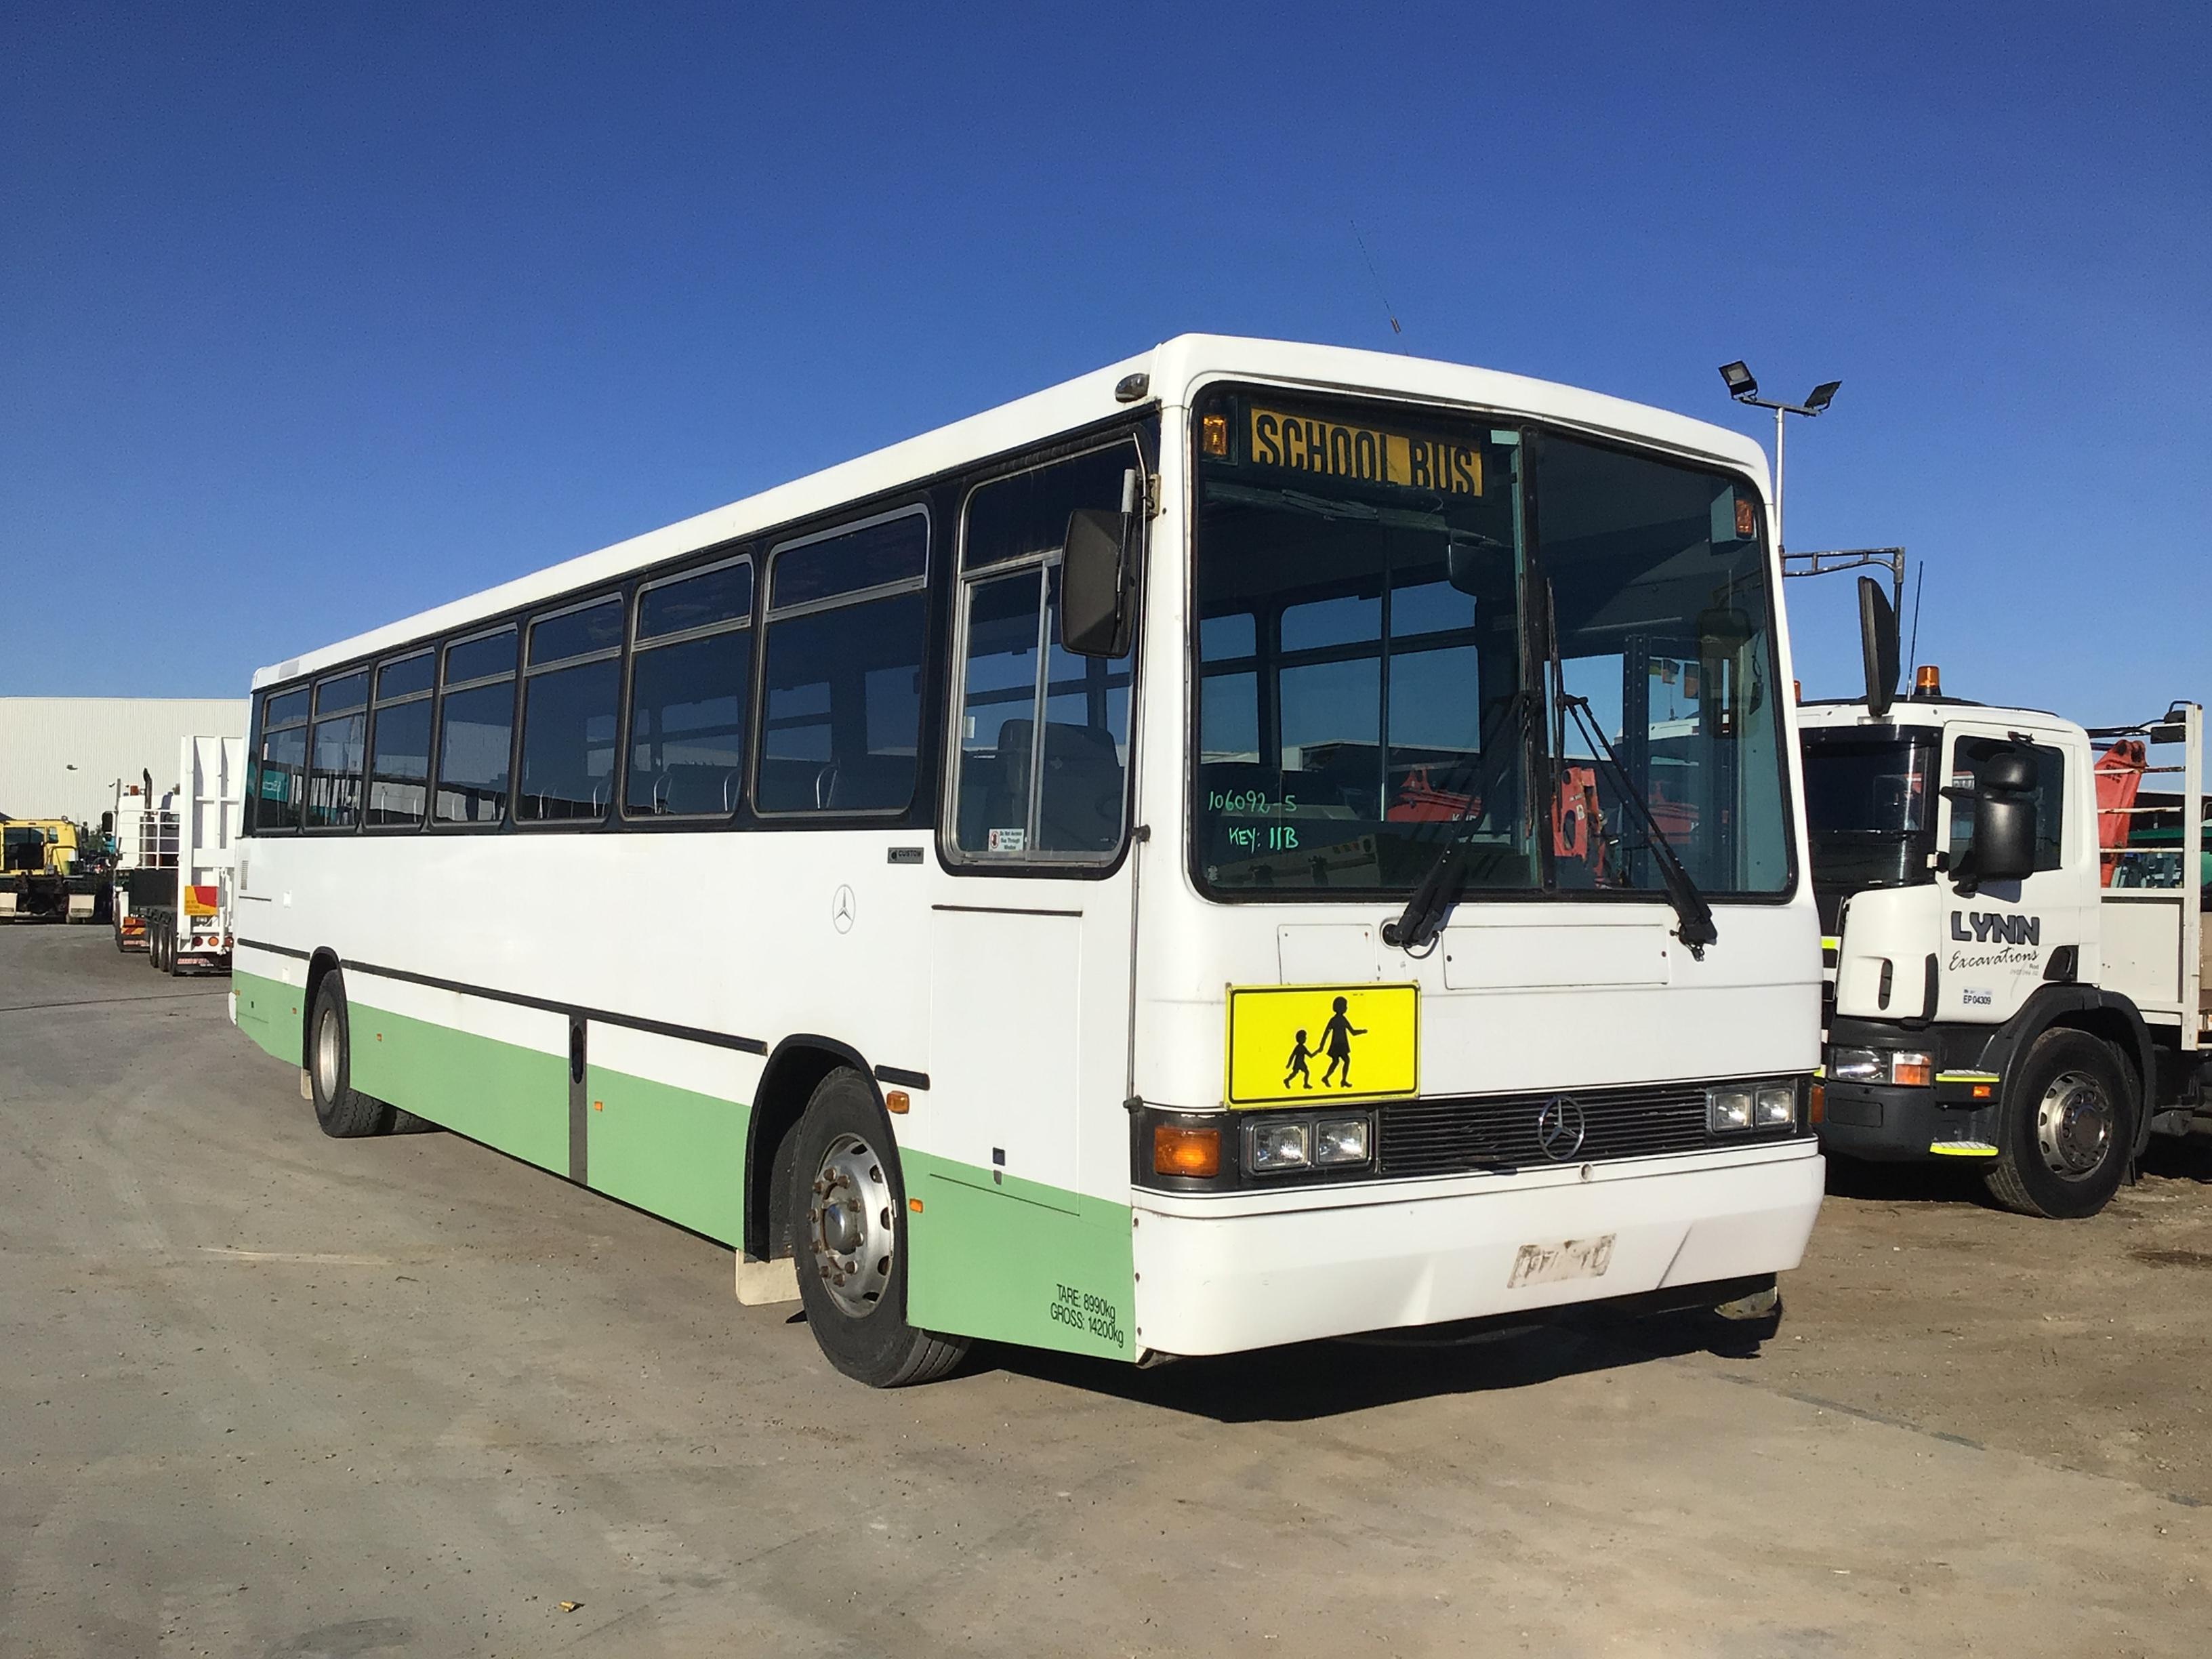 1997 Mercedes Benz OH1418 4 x 2 Bus